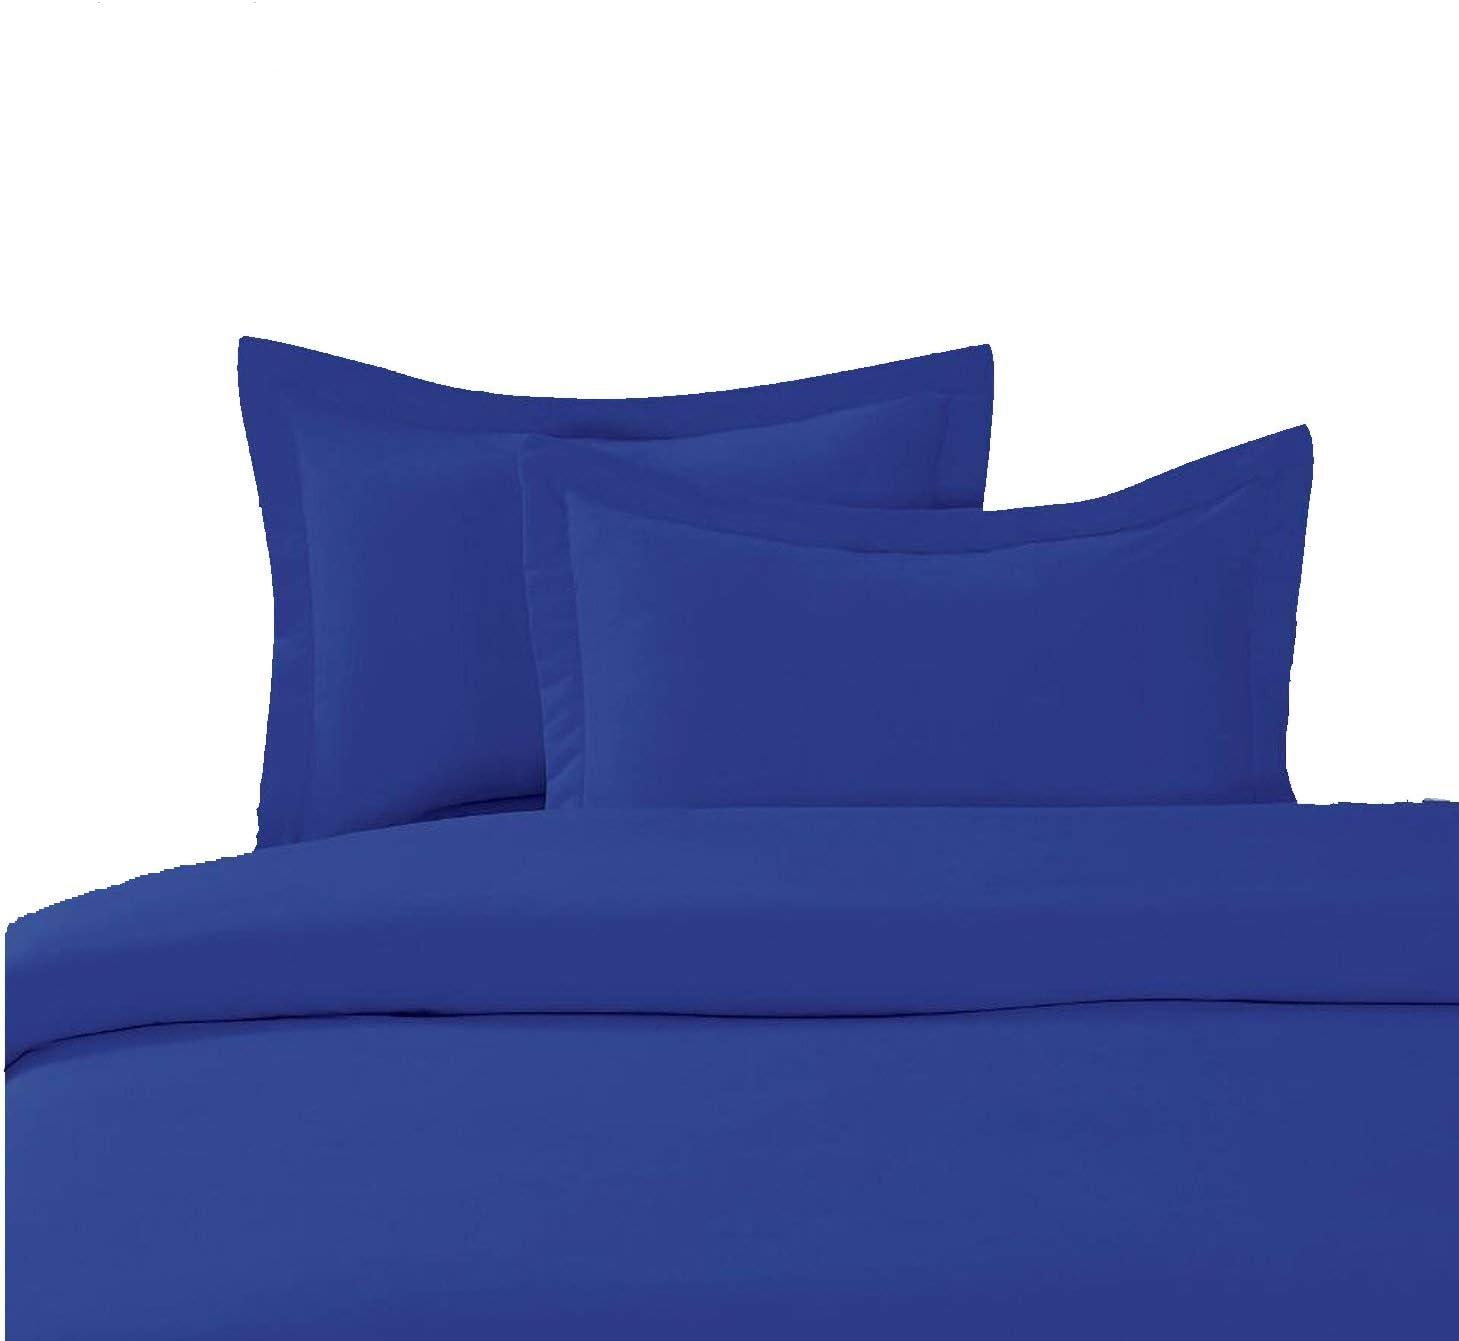 1 Piece Duvet Cover Premium Quality Egyptian Cotton 600 Thread Count Long Staple-Sateen Solid Duvet-Queen Size (Royal Blue) 51KEvQ3-ytL